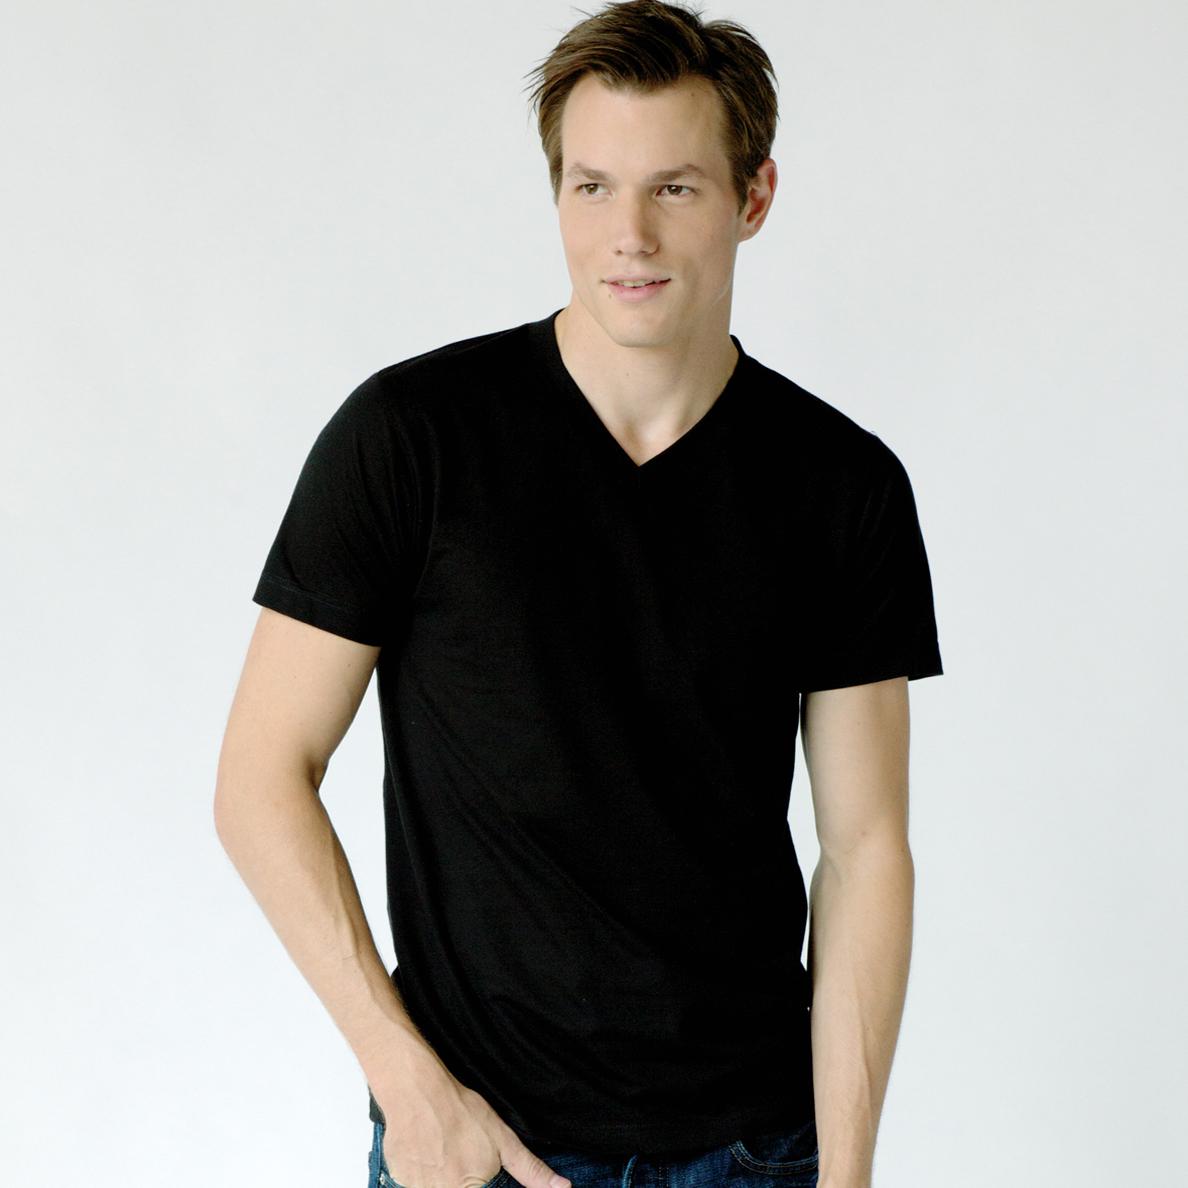 Tultex 0207 - Men s Blend V-Neck Tee  3.58 - Men s T-Shirts c9530f2f8